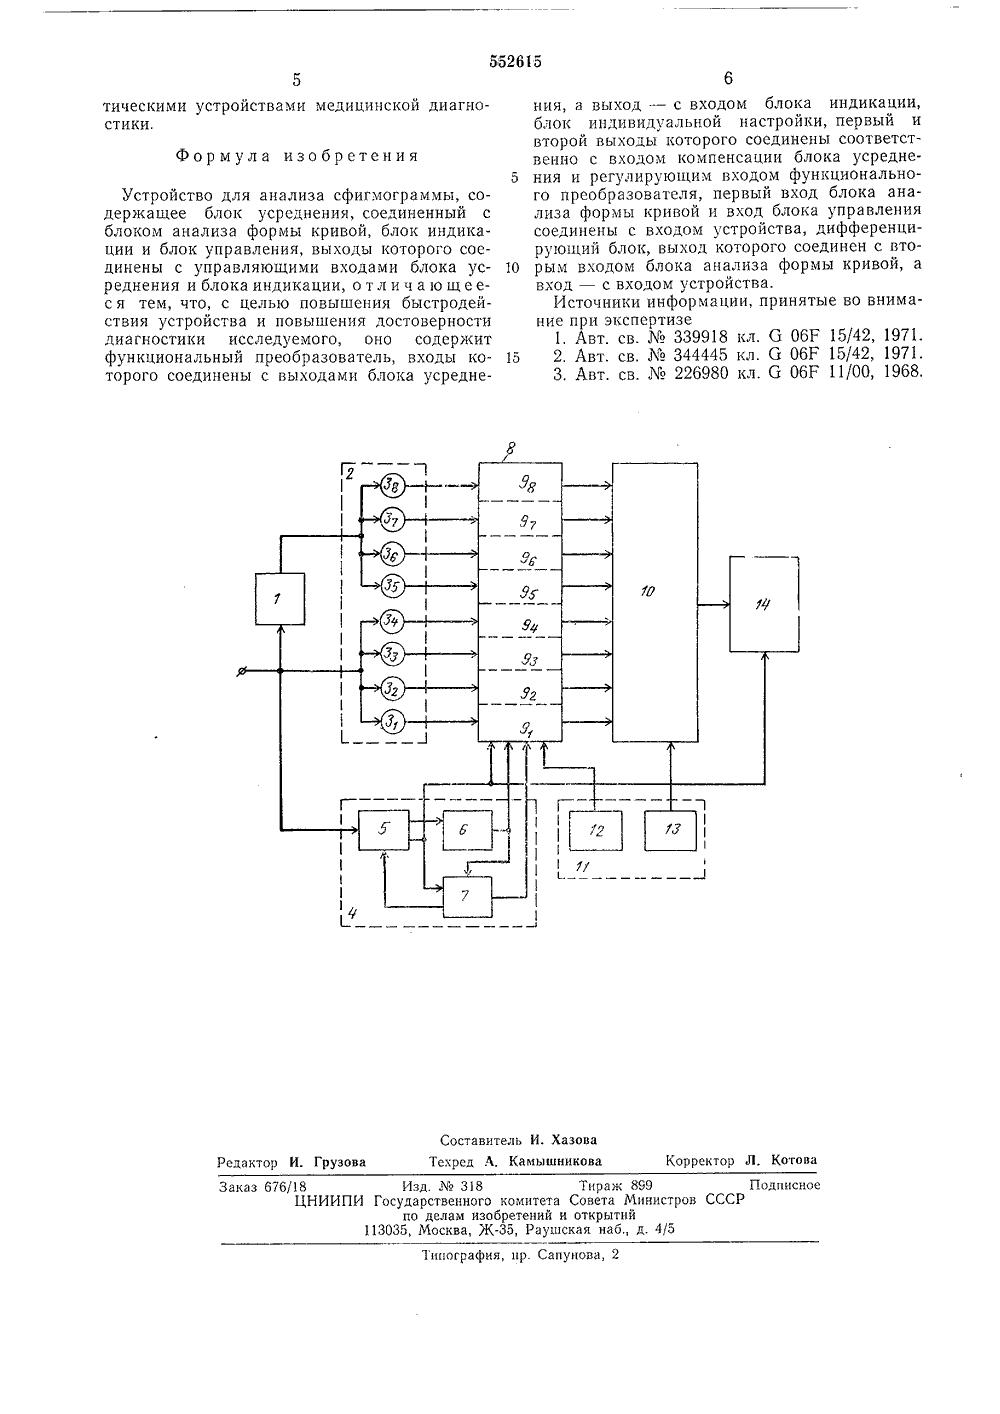 Сфигмограмма схема и ее анализ фото 779